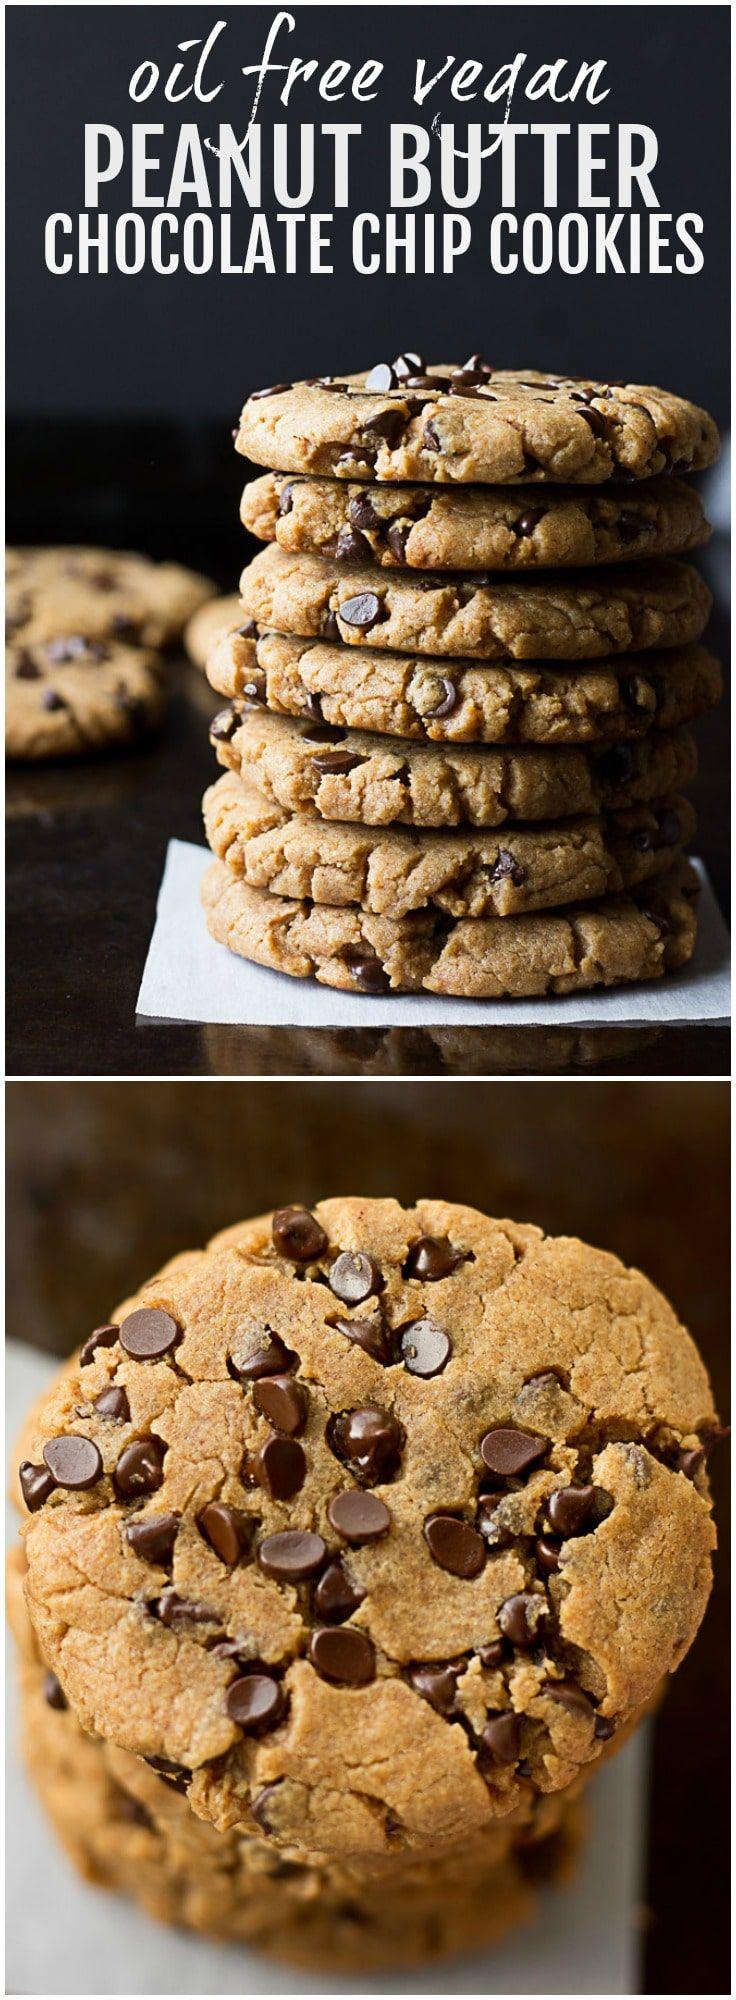 Oil Free Vegan Peanut Butter Chocolate Chip Cookies | Nora Cooks via @noracooks